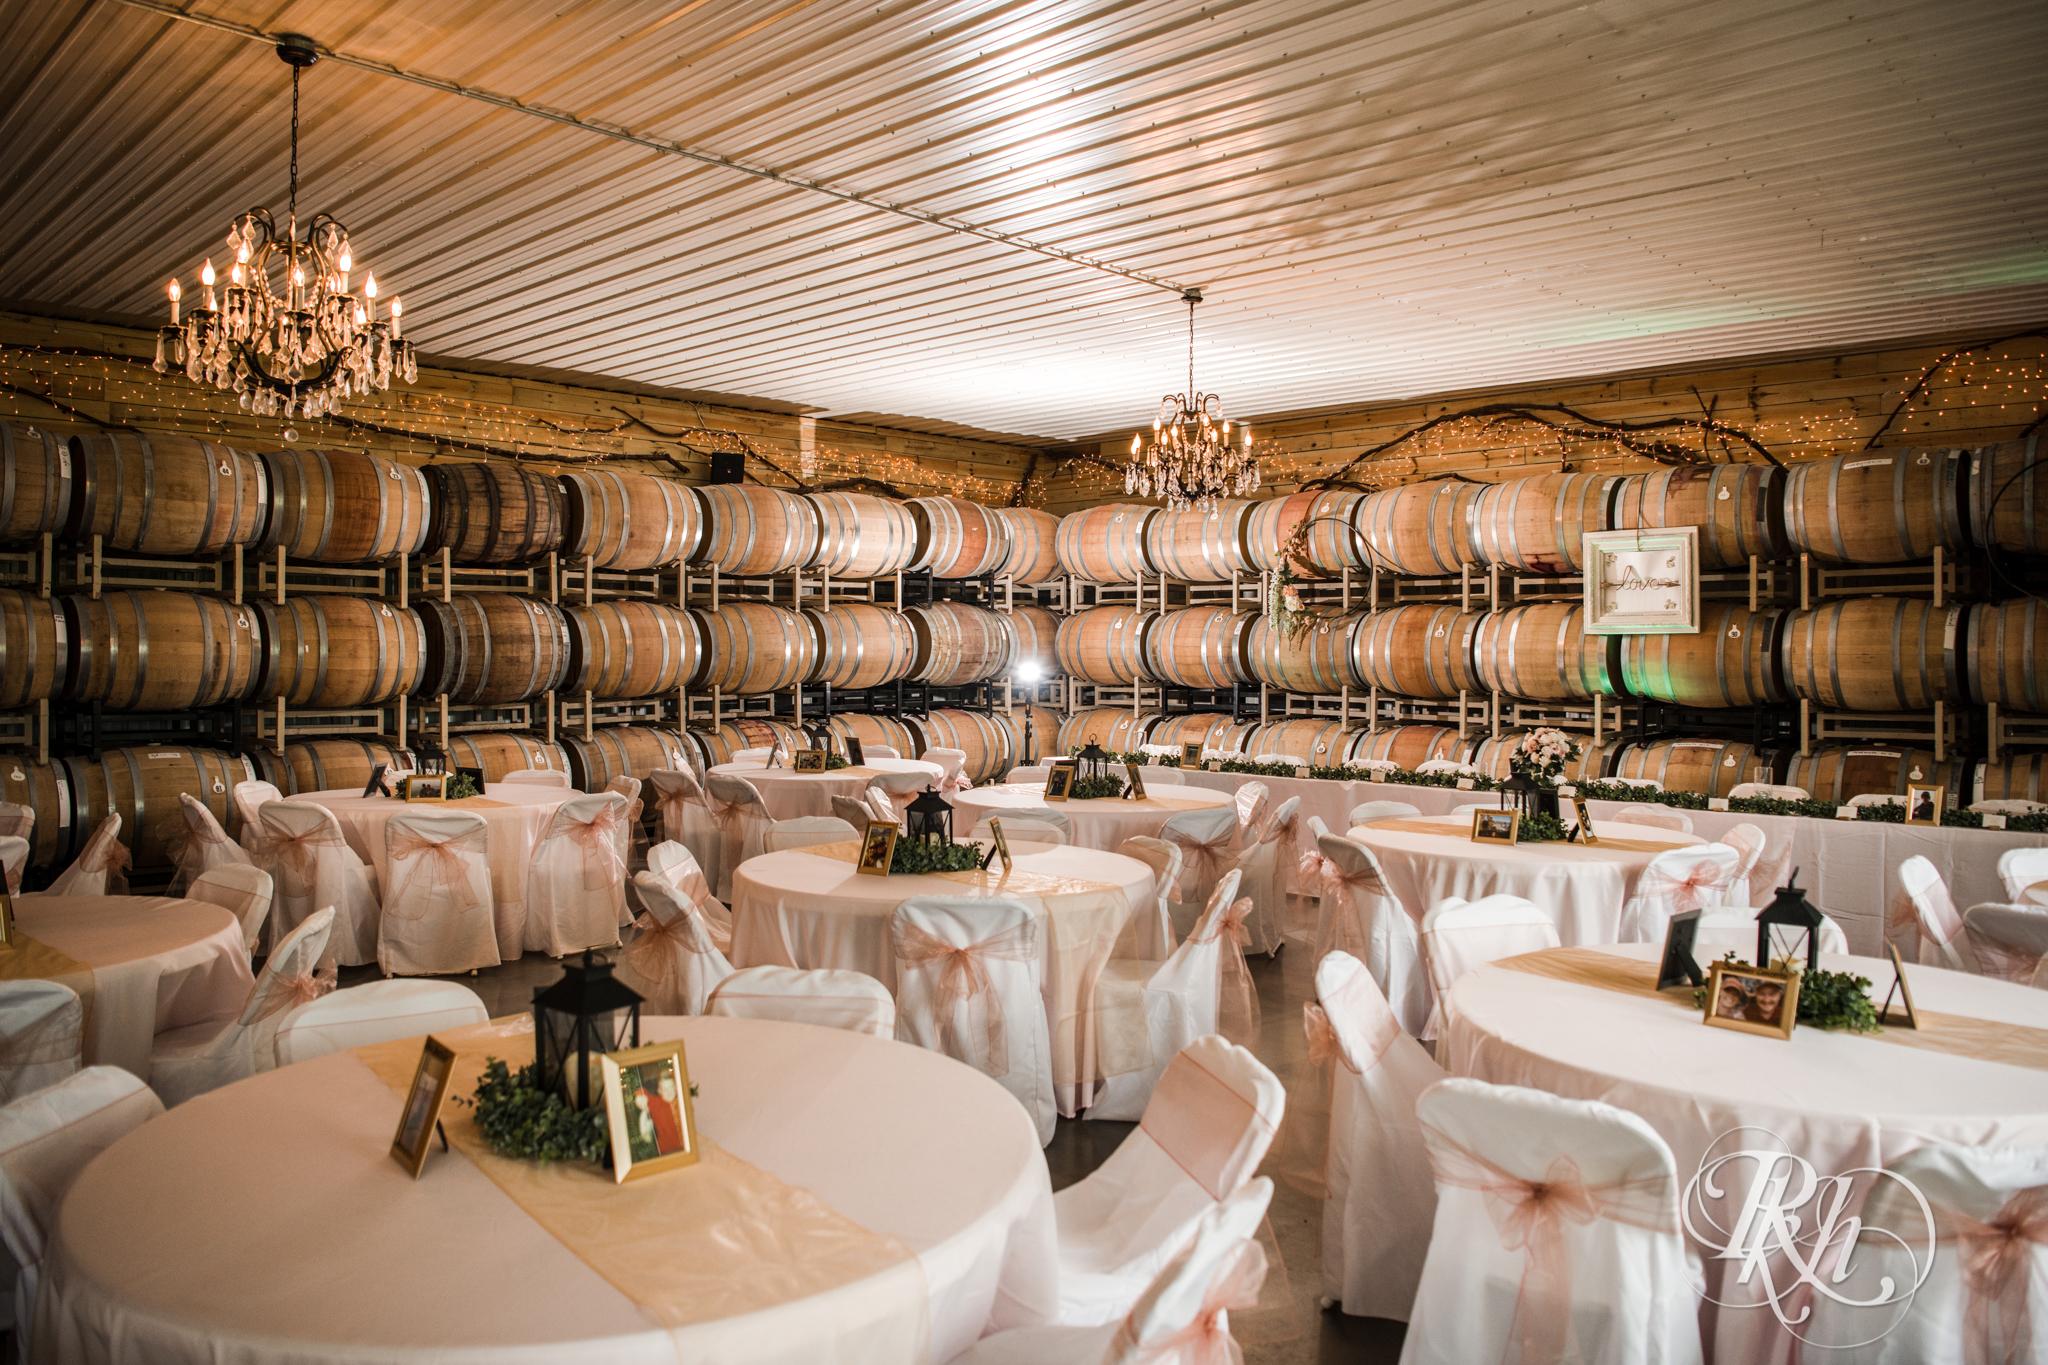 Ally & Nick - Minnesota Wedding Photography - Next Chapter Winery - RKH Images - Blog (5 of 57).jpg